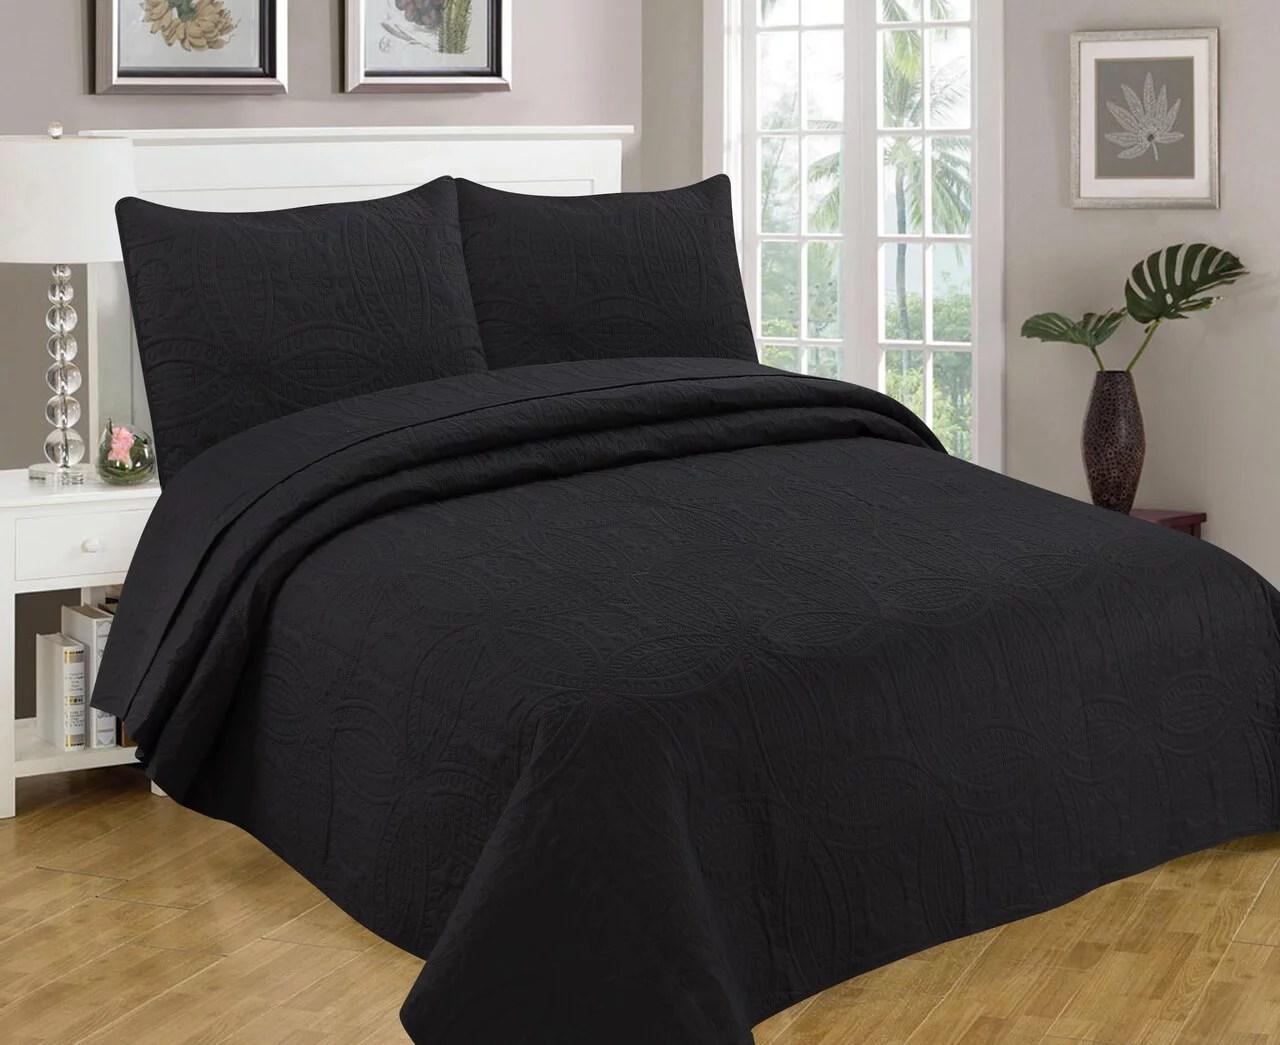 bedspread coverlet 3 pcs set oversized 118 x 106 king size black color walmart com